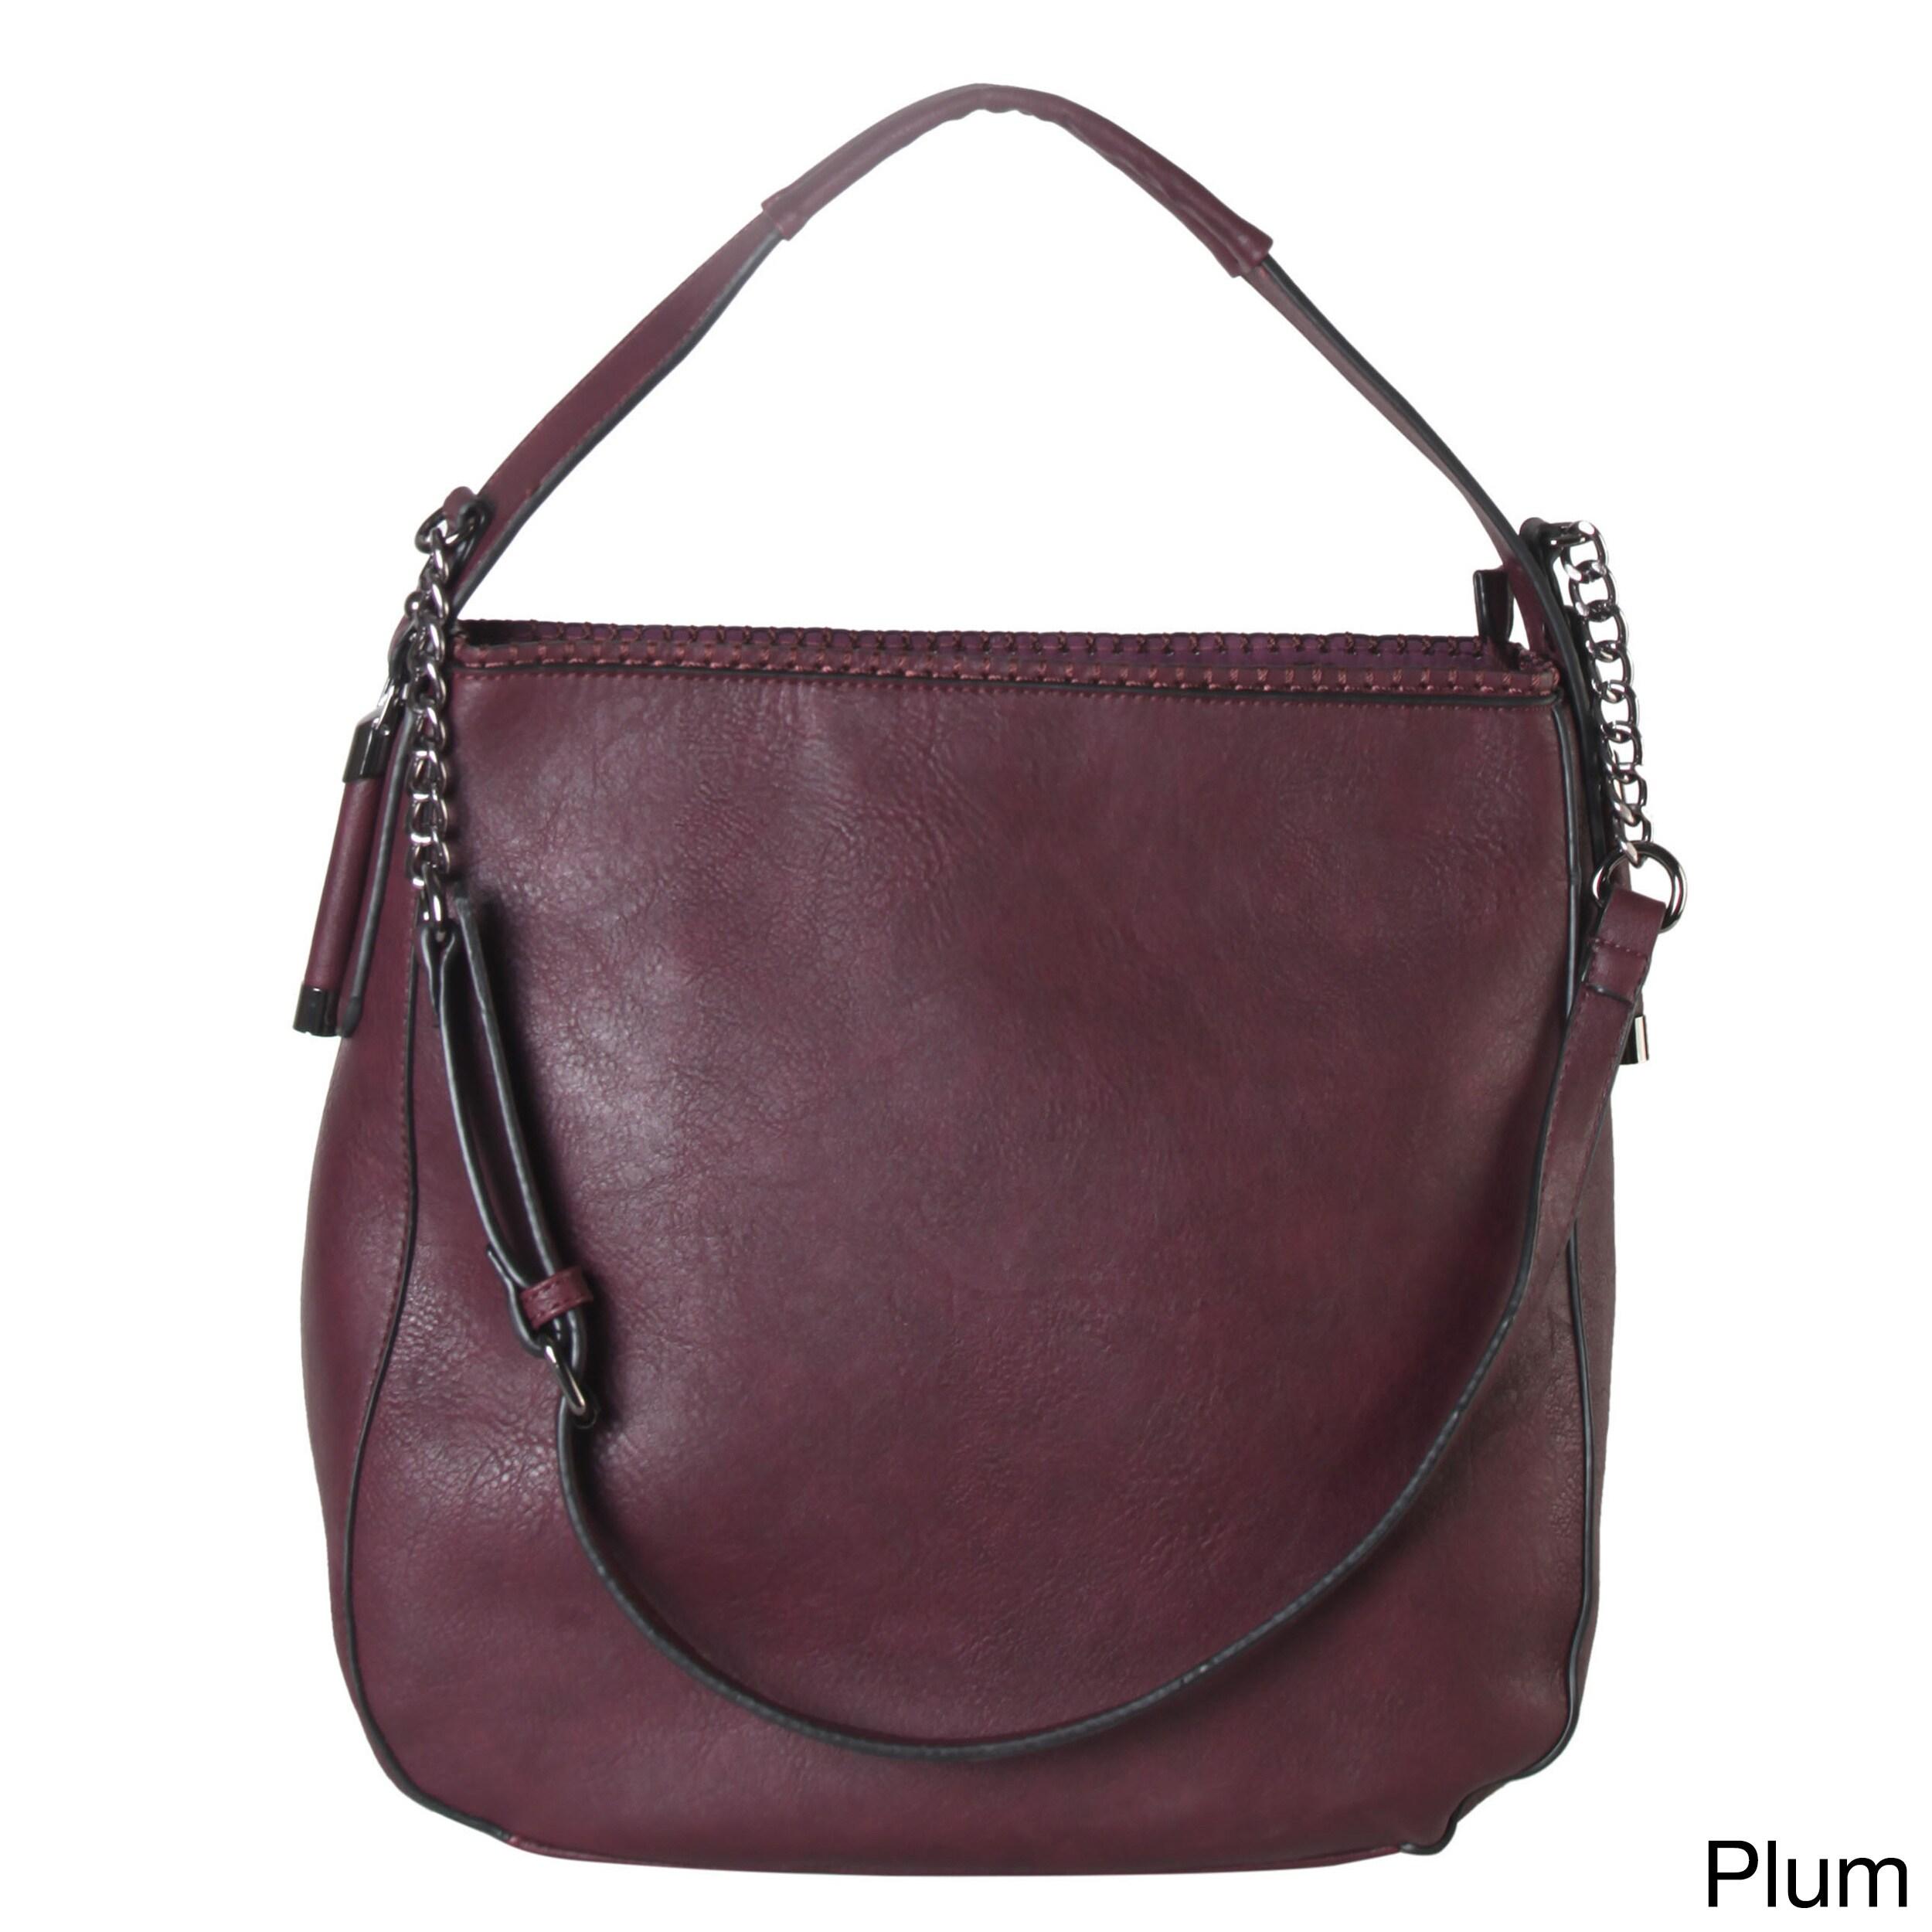 Shop Diophy Chain Shoulder Strap Hobo Style Handbag - On Sale - Free ... 6dc1f972ac